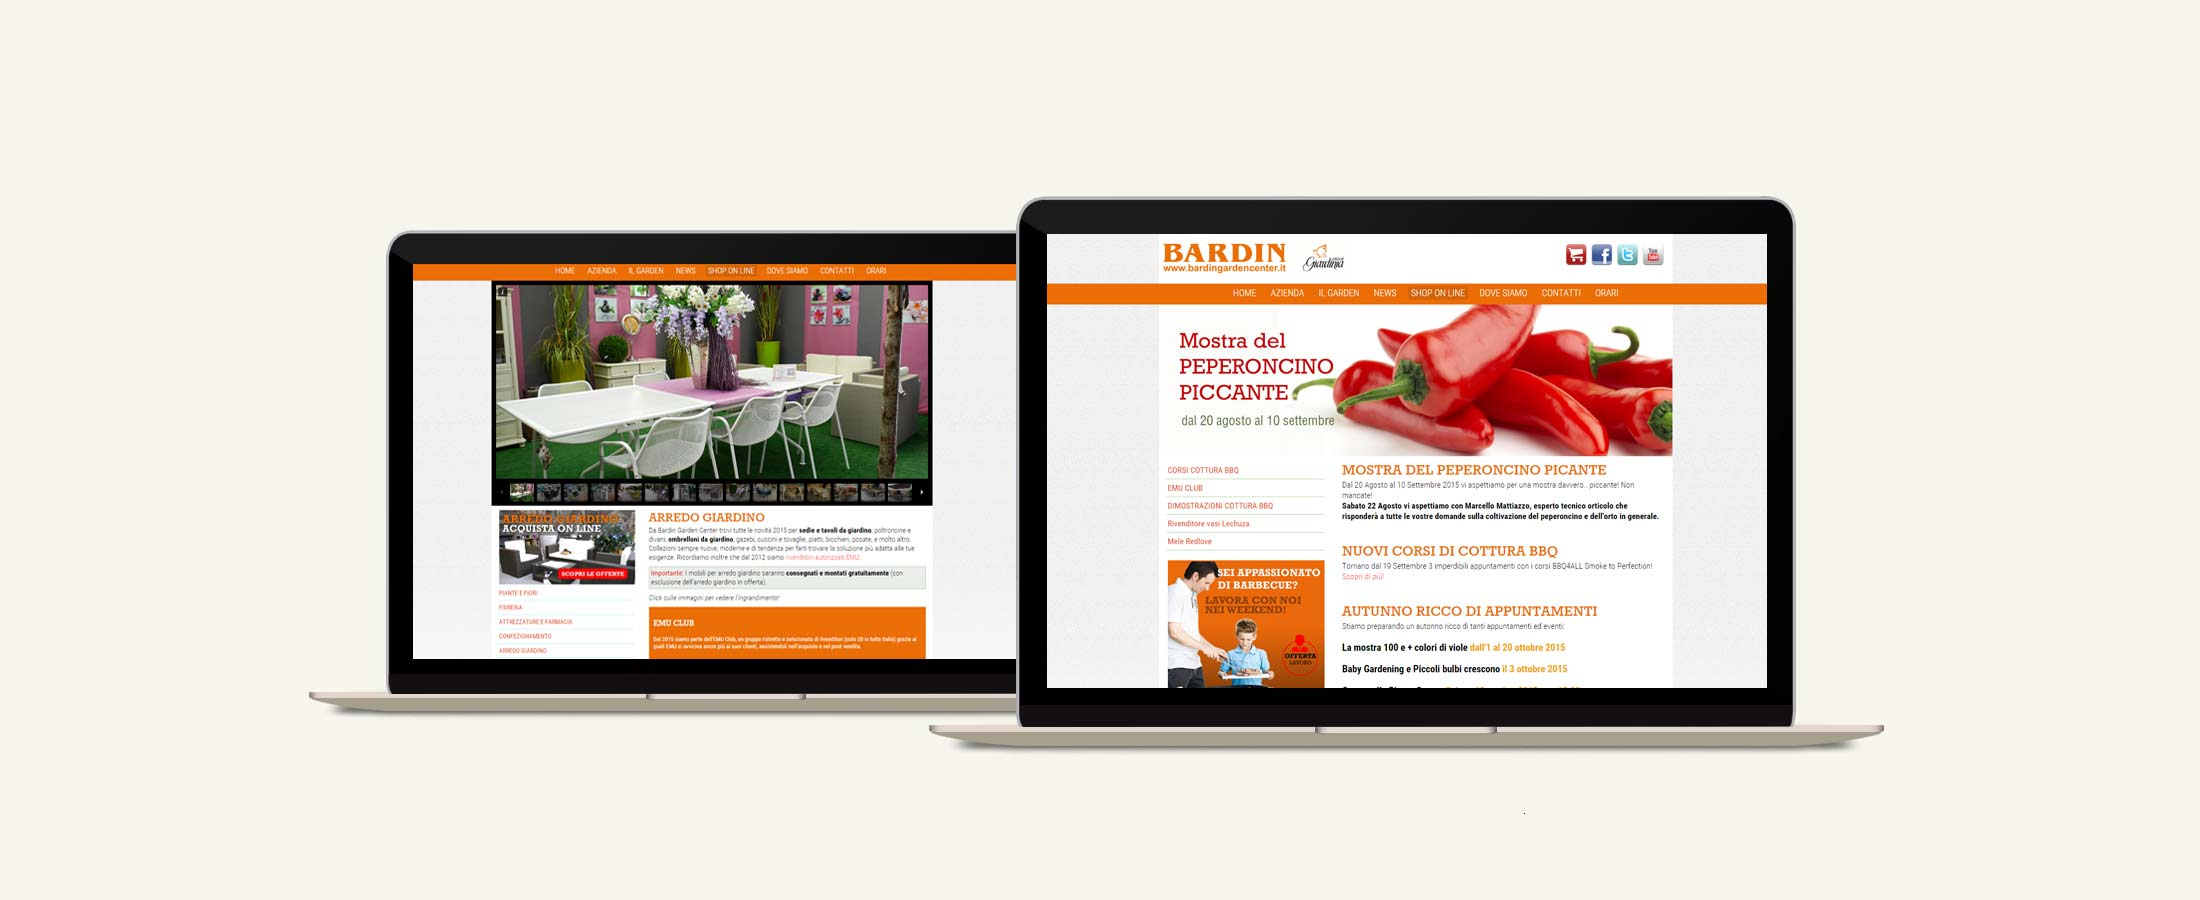 Bardin Shop Websolution Web Agency Treviso